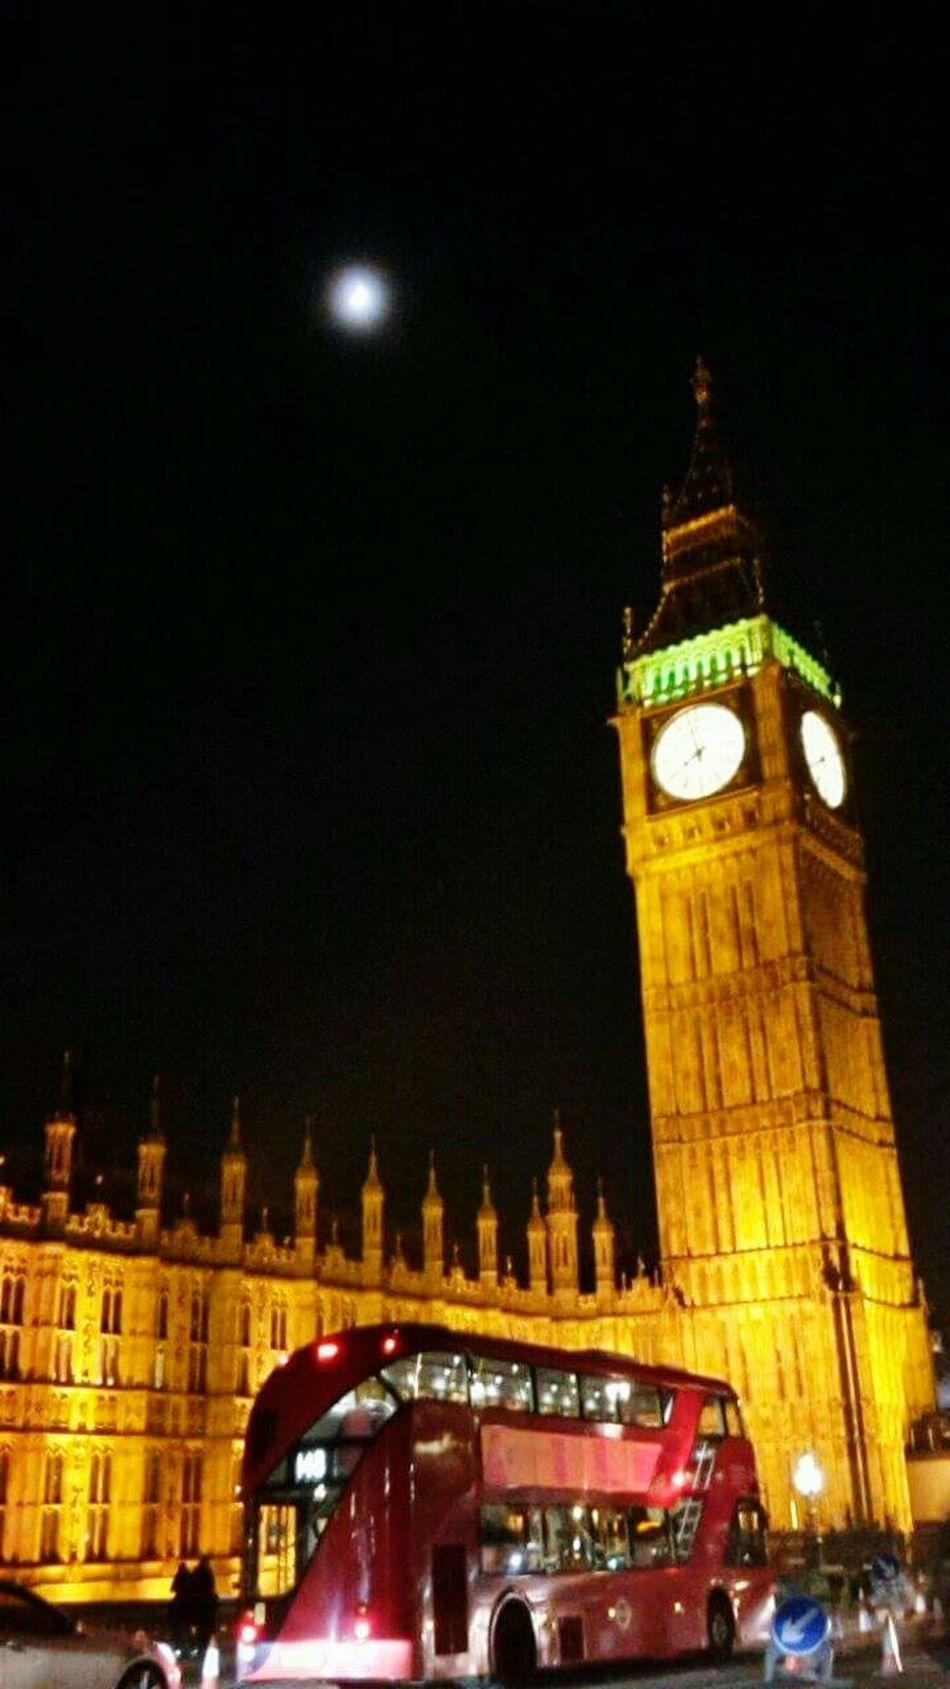 LONDON❤ Night Clock Tower Clock Illuminated Travel Destinations City Architecture Moon Londonbus Big Ben